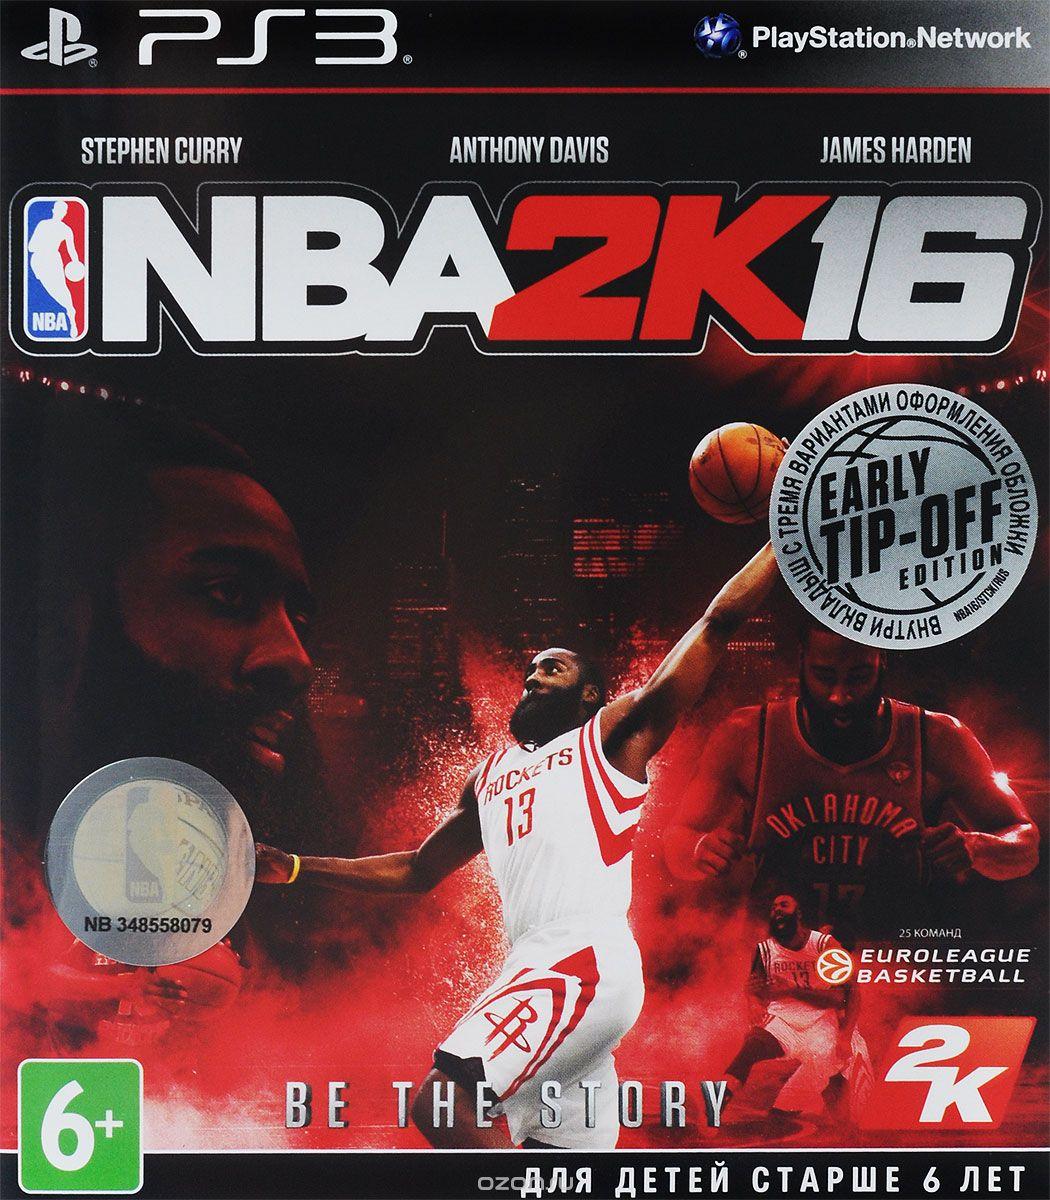 NBA 2K16 (PS3) 2K Sports,Visual Concepts